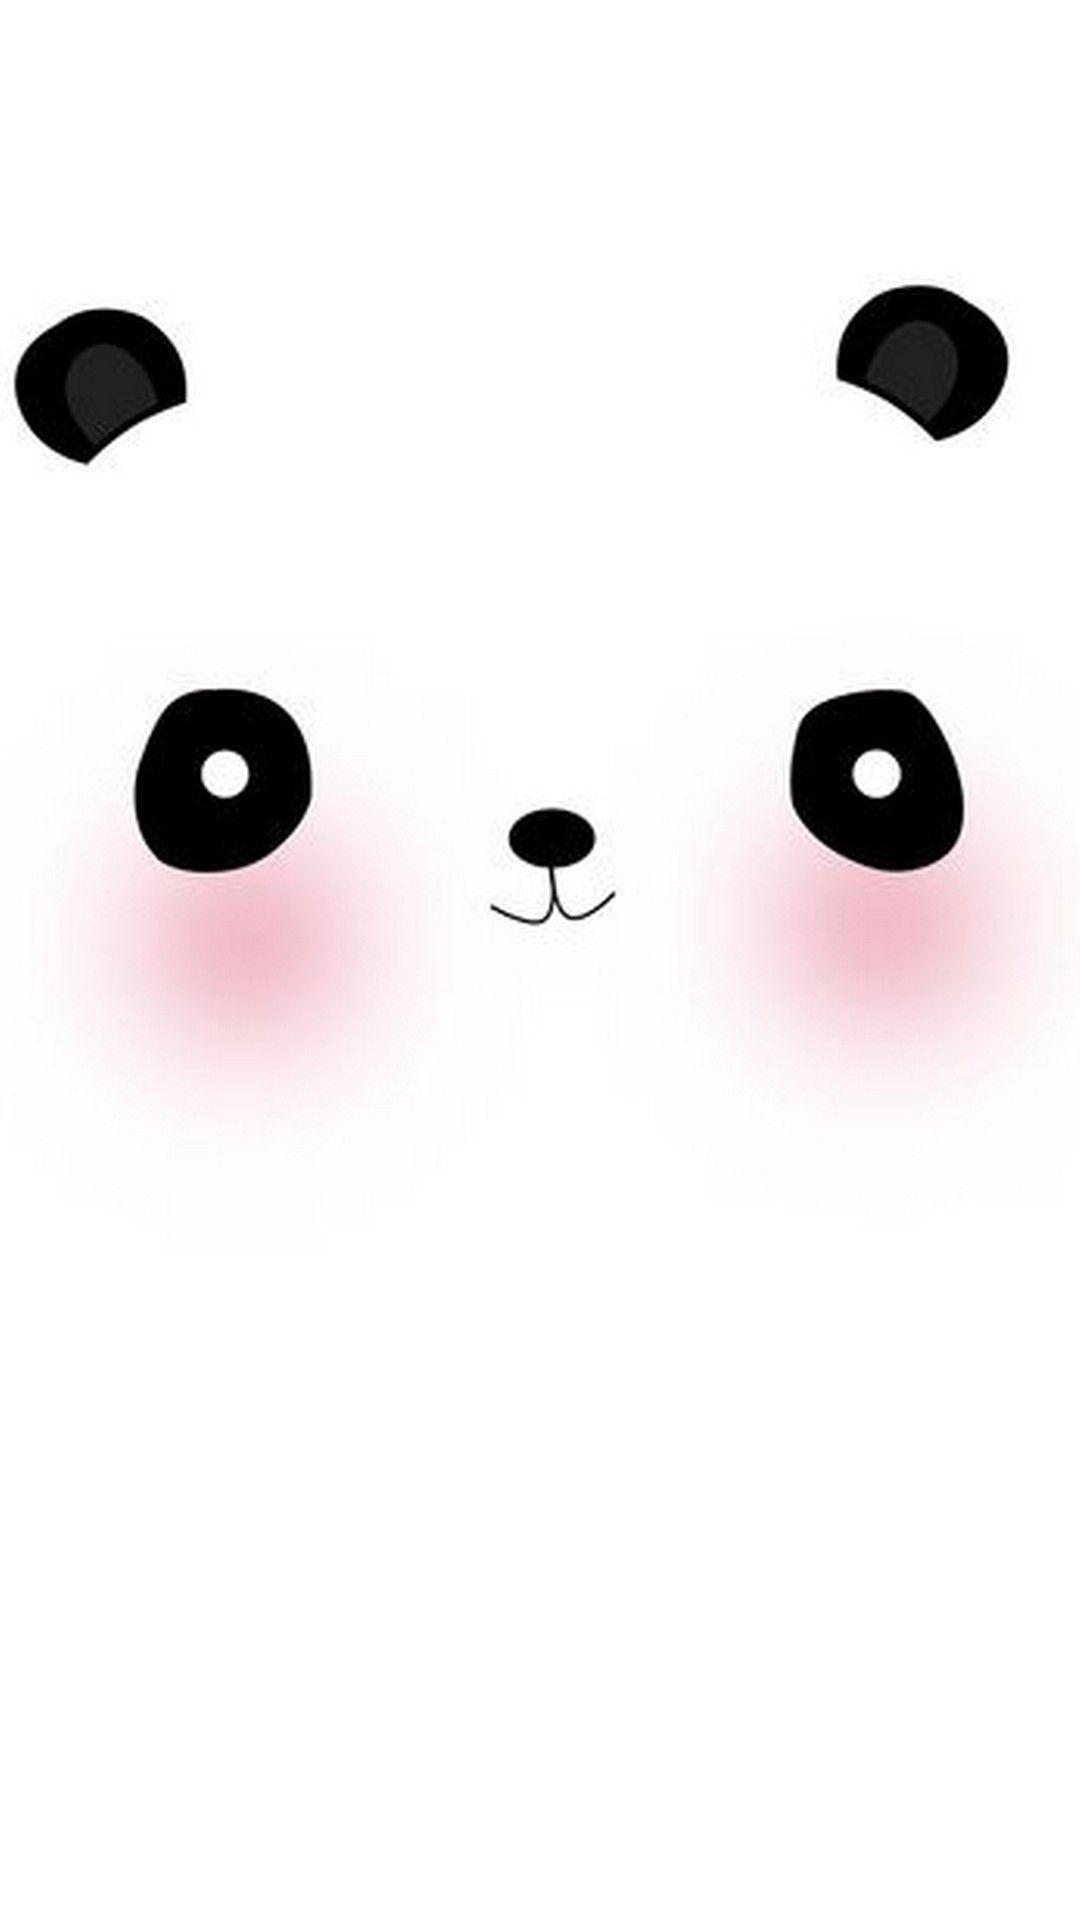 Cute Panda Wallpaper For Mobile Best Hd Wallpapers Iphone